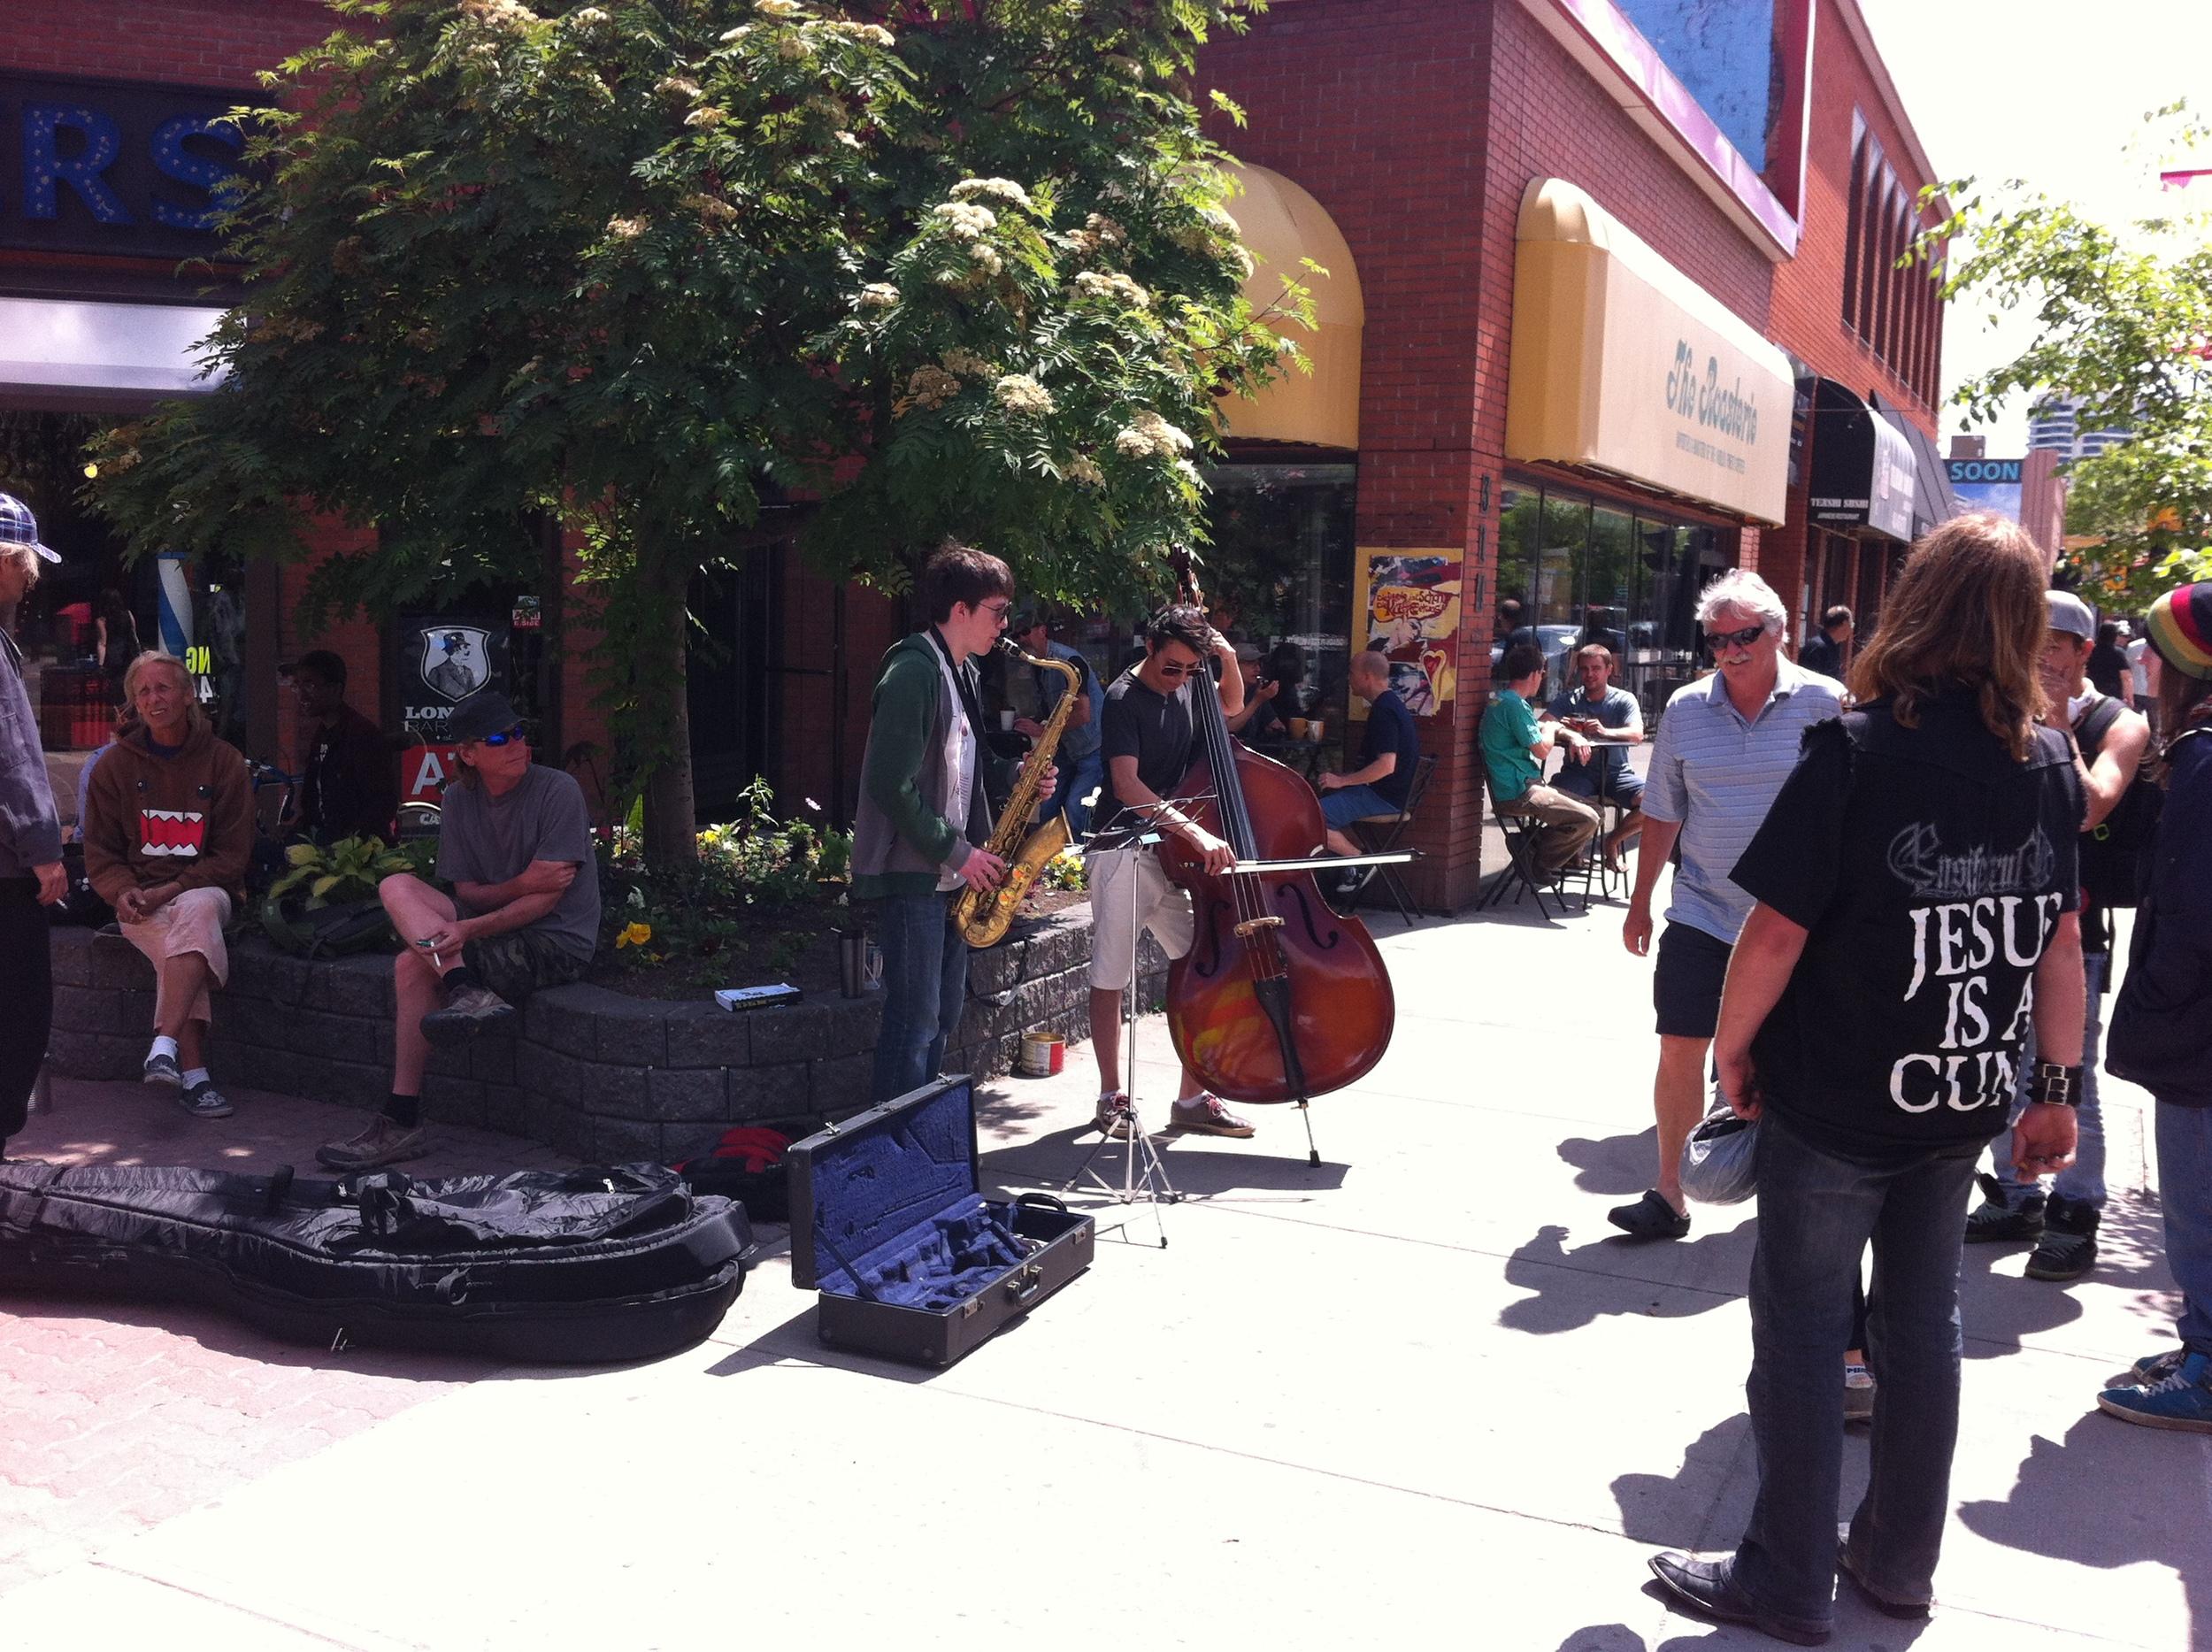 Calgary's street culture.